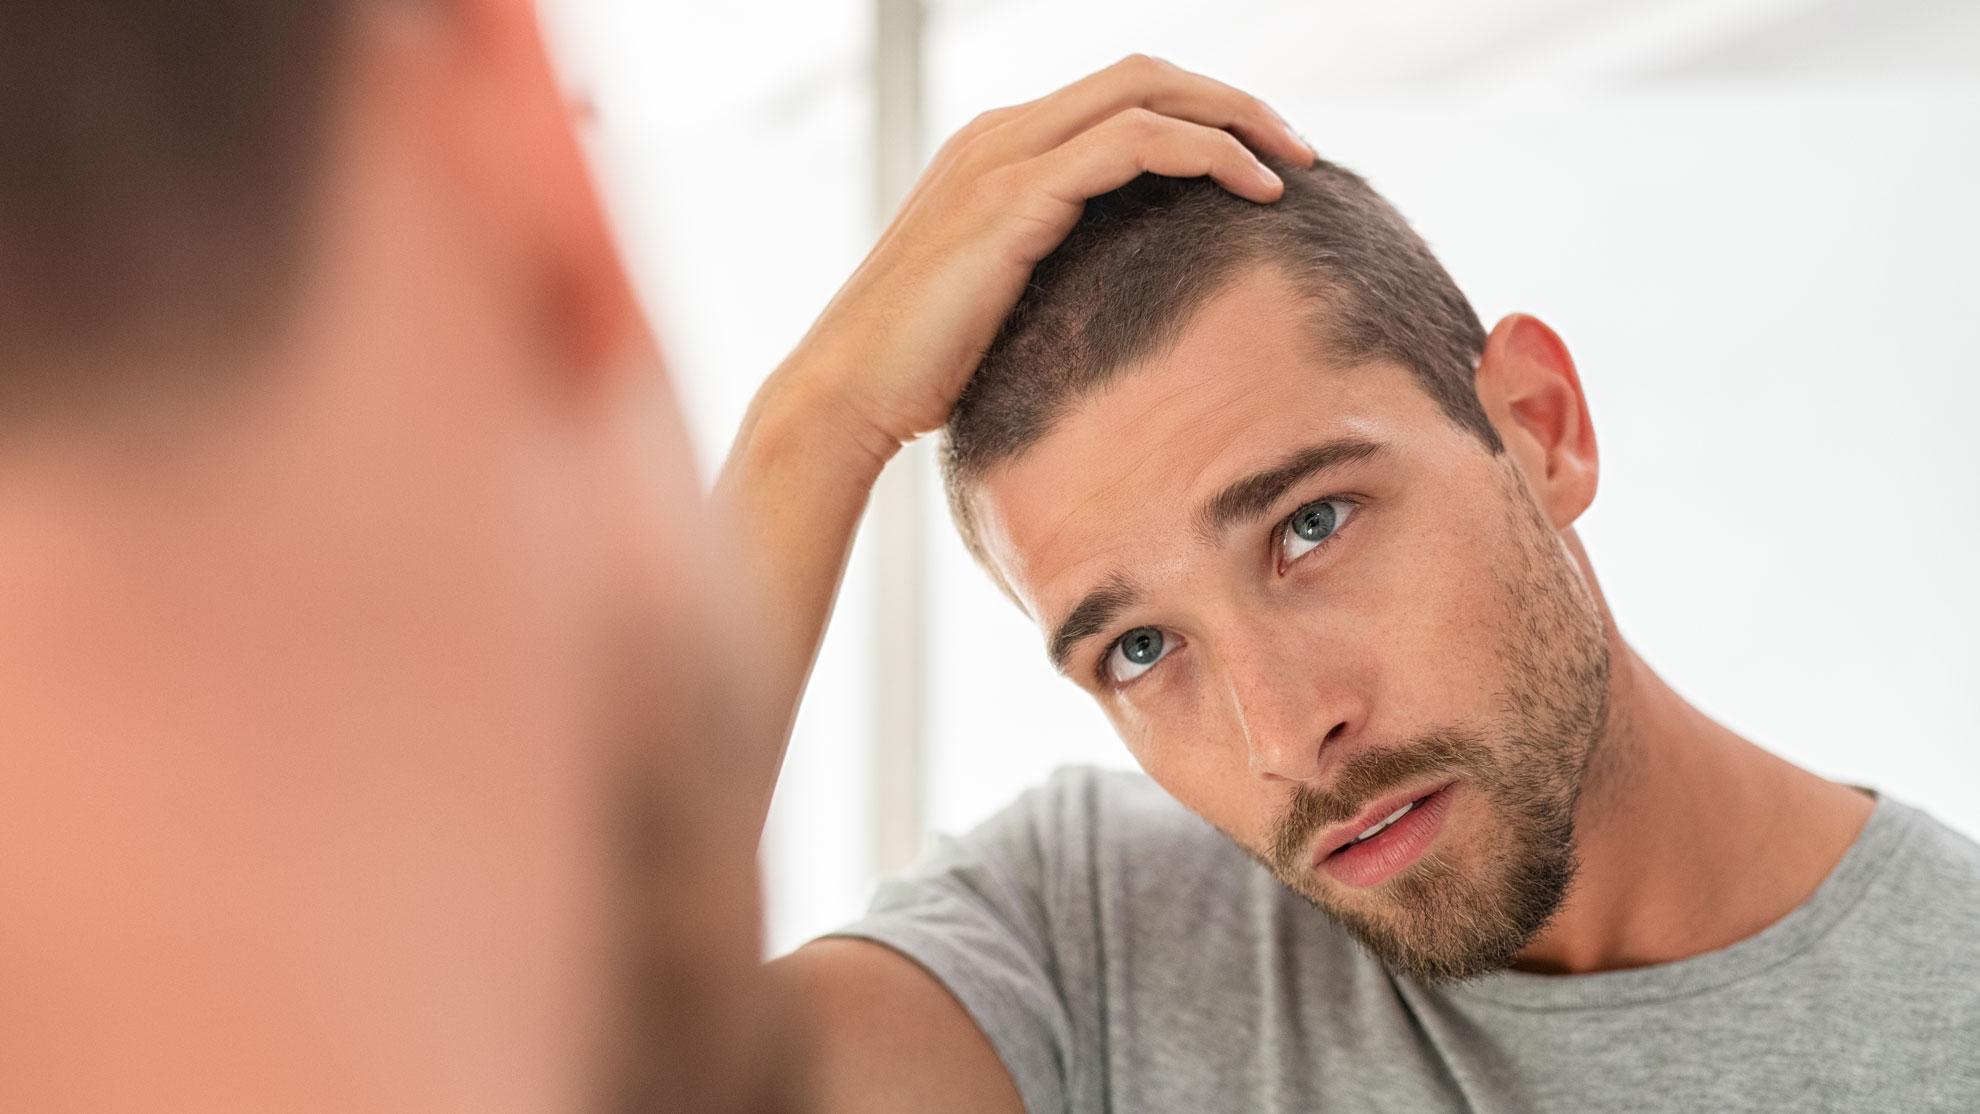 Hair Loss Treatments Explained Minoxidil Finasteride Biotin Dht Blocking Man For Himself